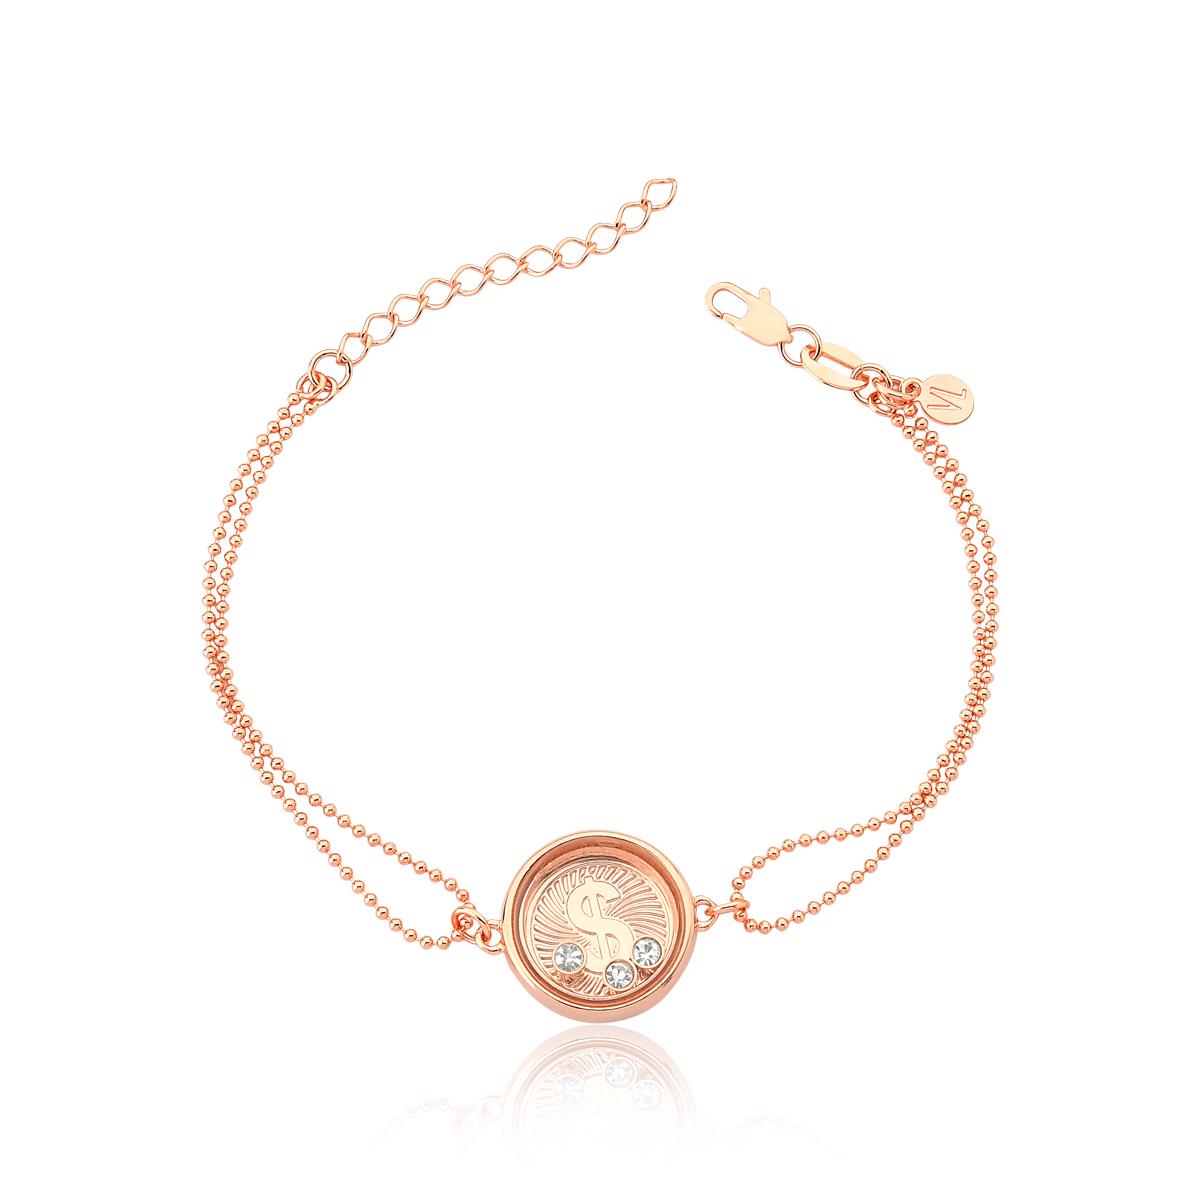 Pulseira Reliquaire Ballet Crystals Prosperity Revestida em Ouro Rose